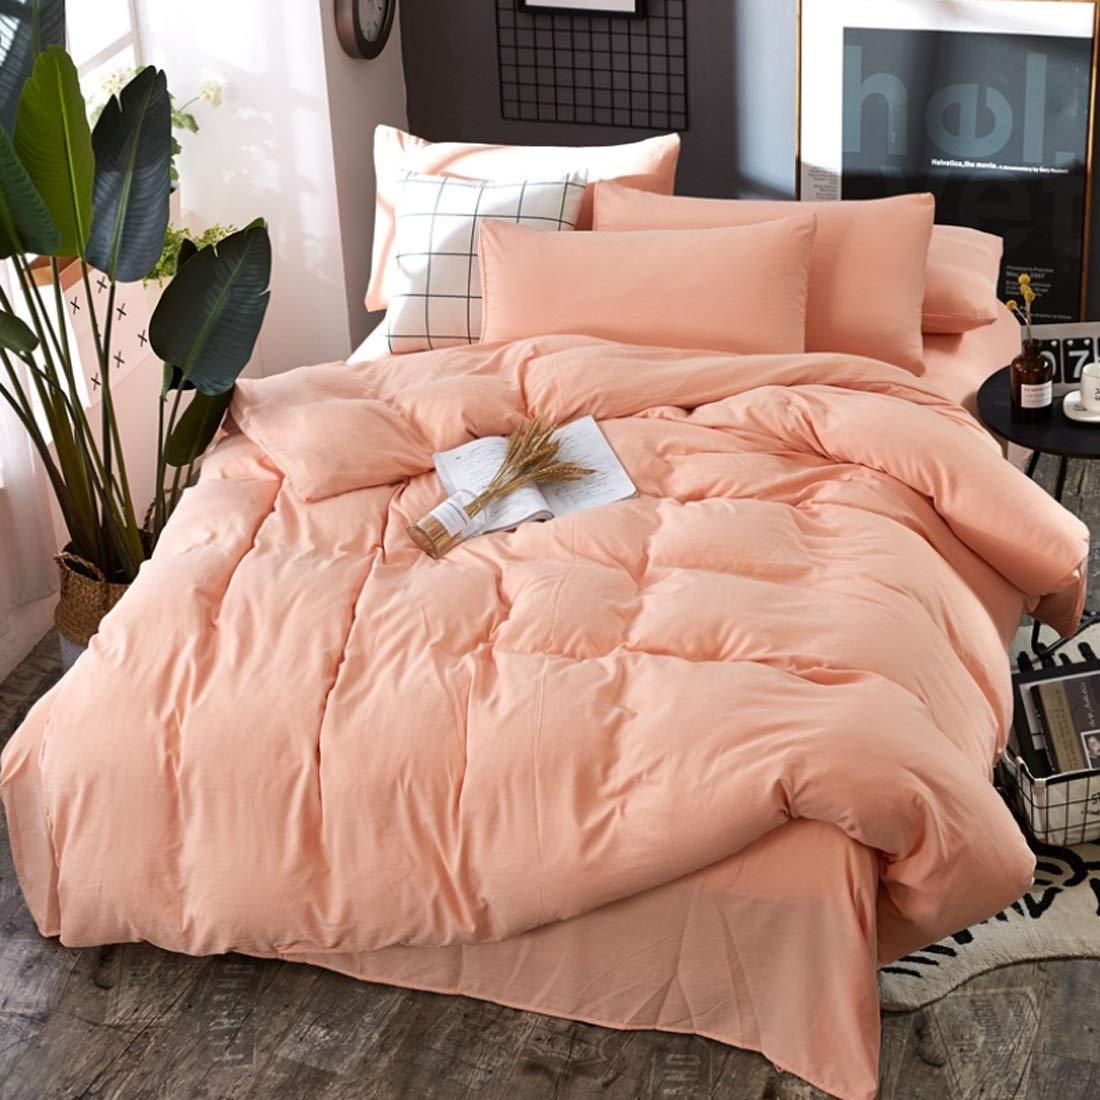 Keriya Sende 4セットのベッド寝具セット 綿 高級 ベッドリネン枕カバー インテリアに適し 掛け布団カバー 洗える 抗菌 防臭 寝具カバーセット (色 : オレンジ, サイズ : 200*230CM) B07T621CY8